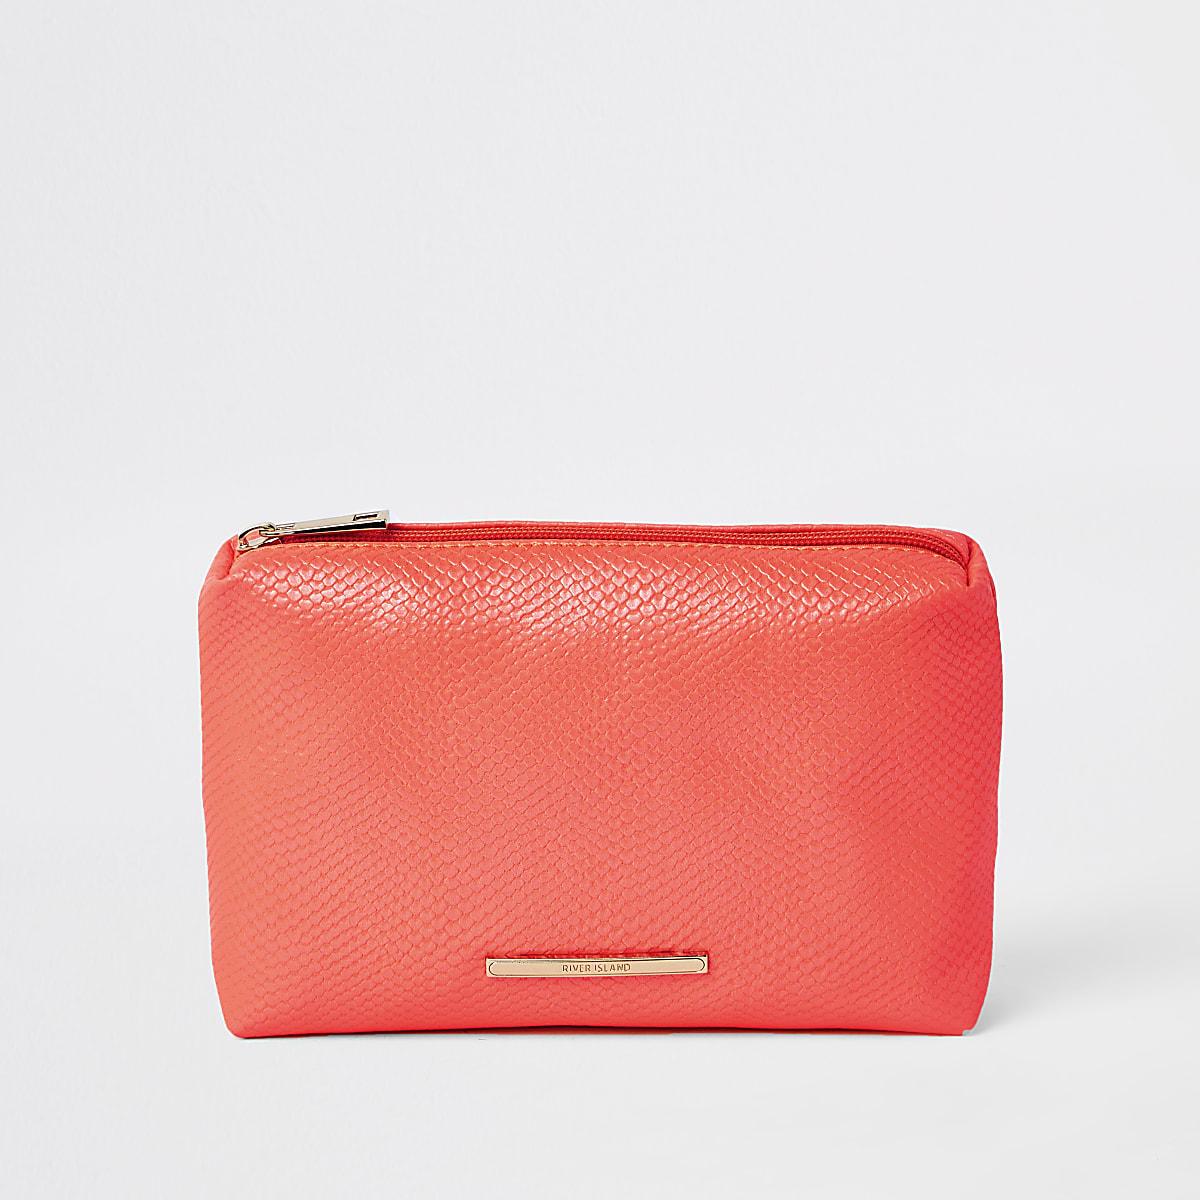 Neon orange croc embossed makeup bag